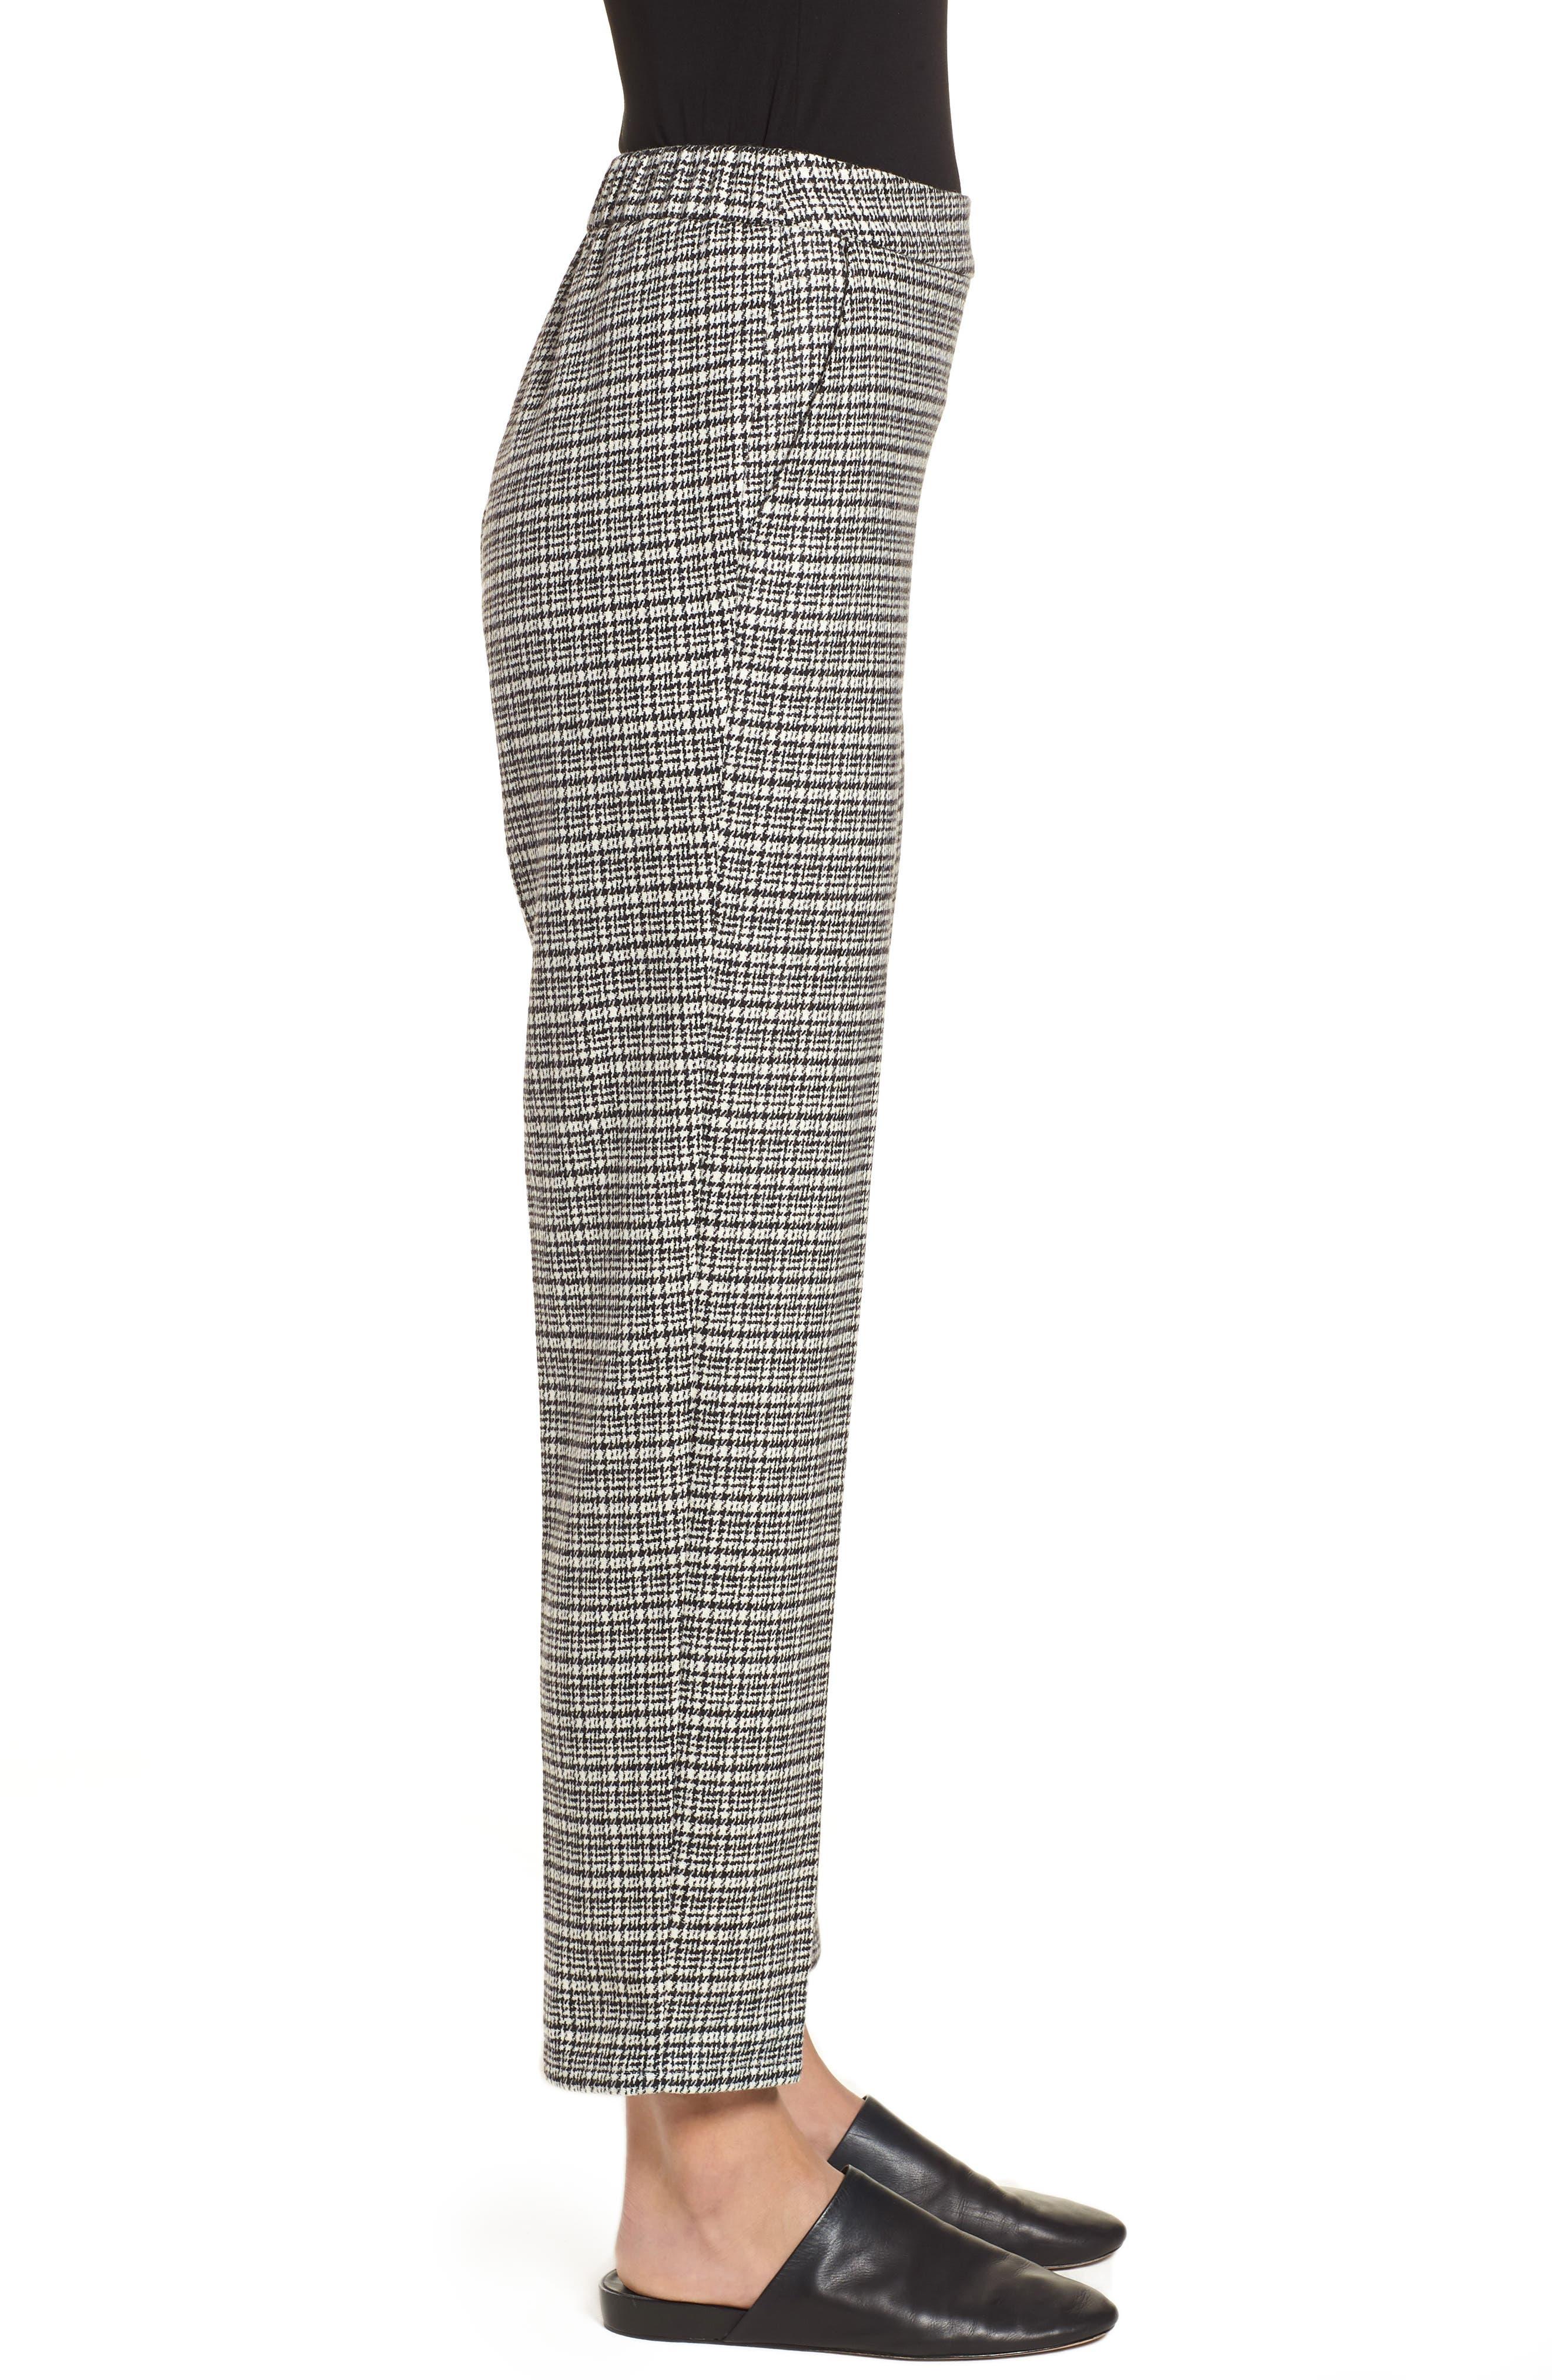 Slim Ankle Pants,                             Alternate thumbnail 3, color,                             Black/ White